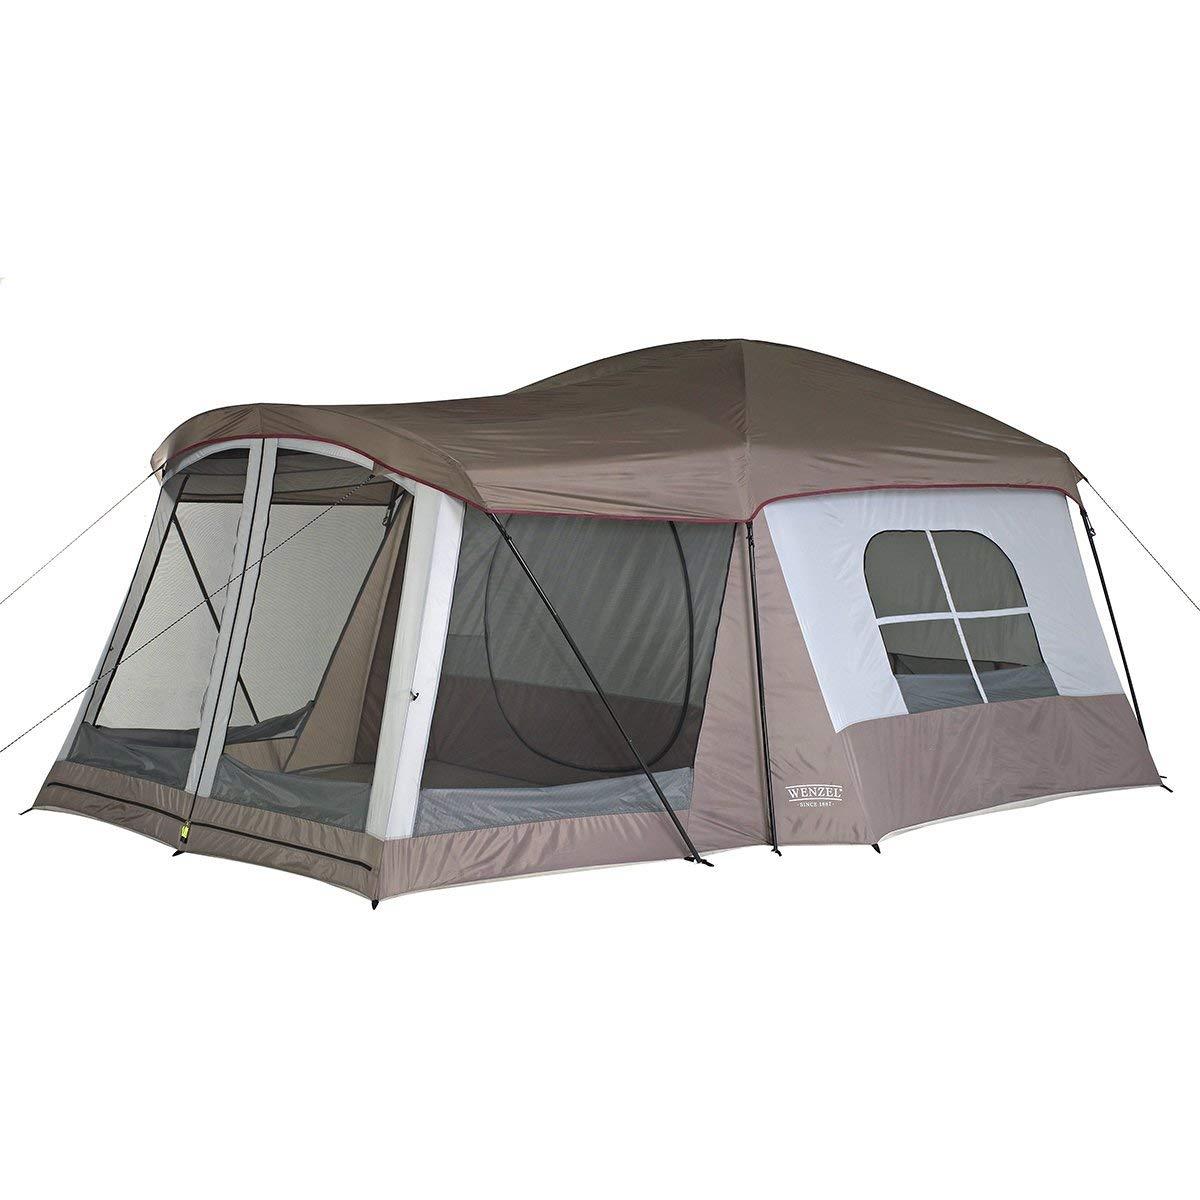 Wenzel(ウェンゼル) Klondike (クロンダイク) 8人用 テント Grey/Taupe Grey/Taupe 家族で星空を楽しめます テント 8人用!, VENICE:b32448e8 --- acessoverde.com